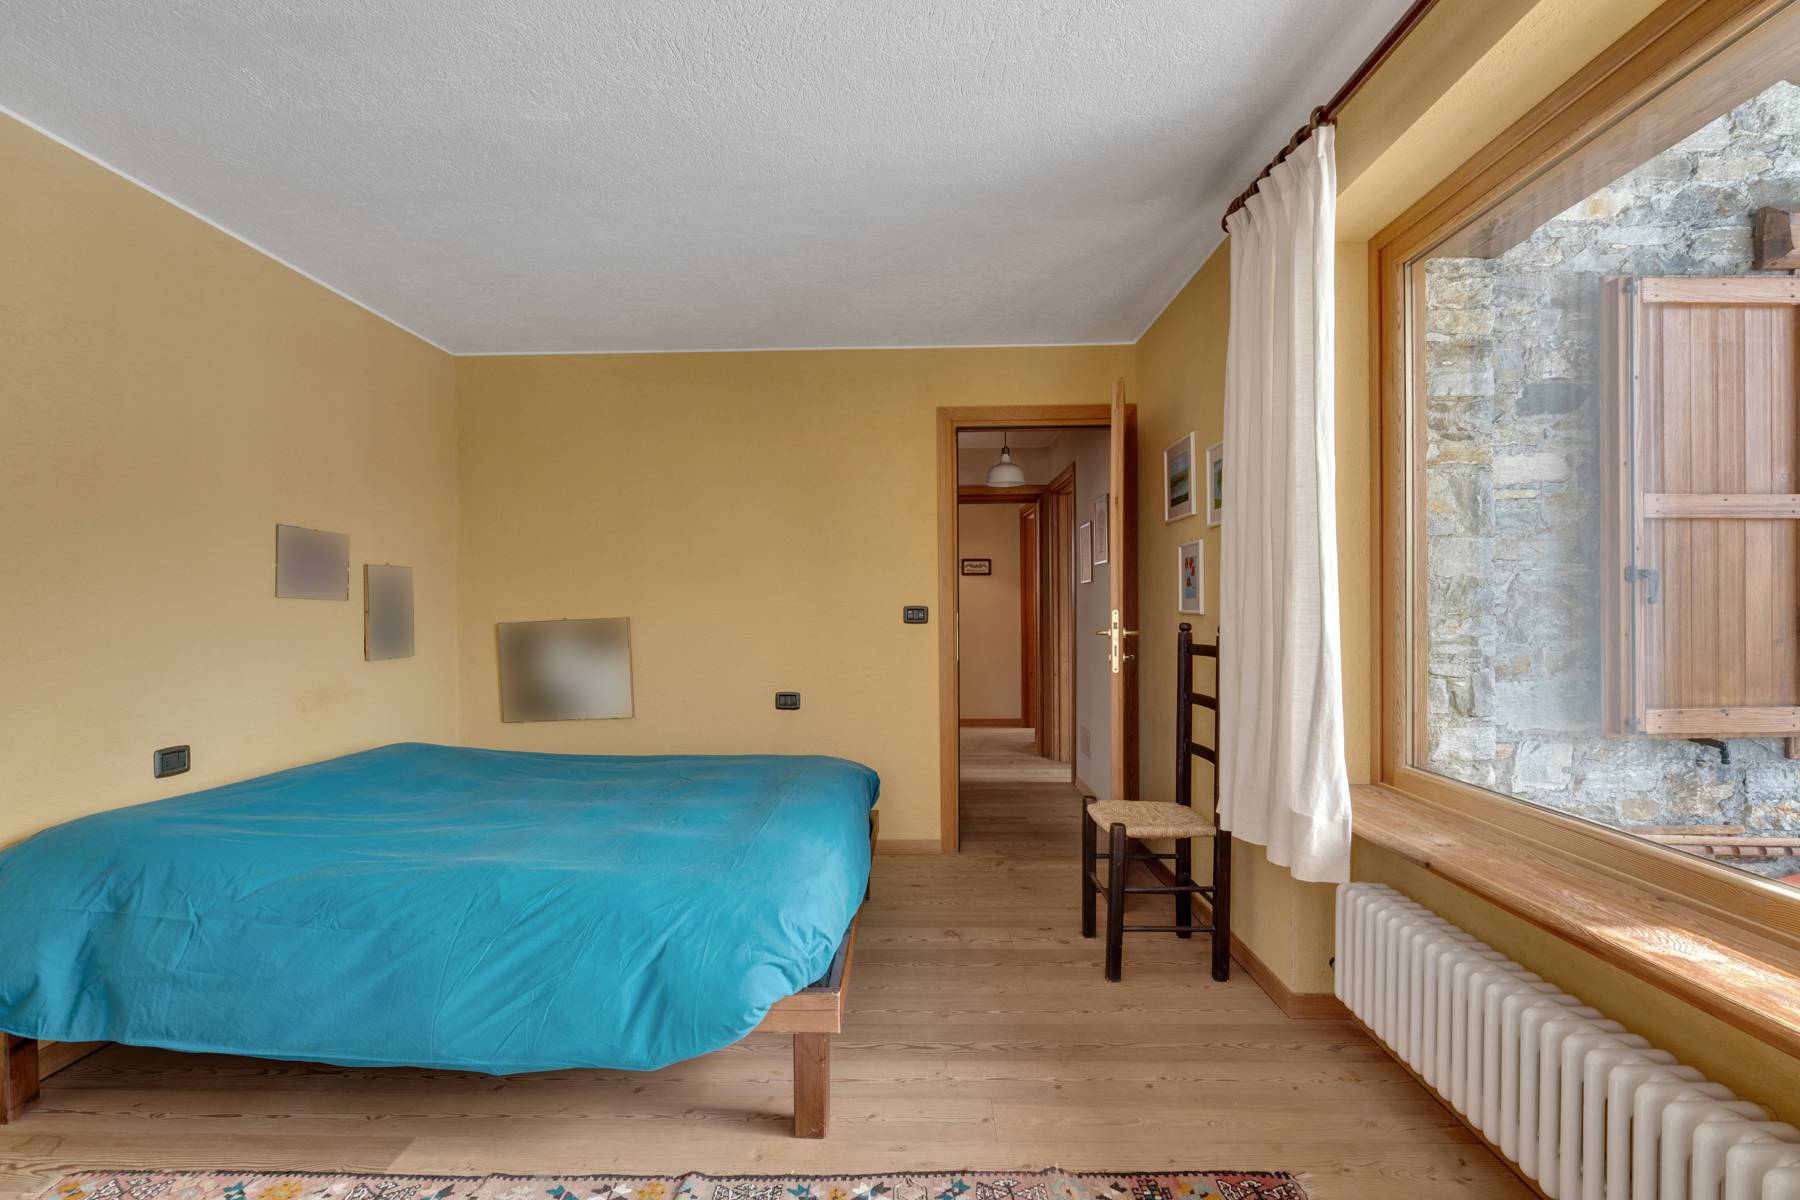 Villa in Vendita a Cogne: 5 locali, 384 mq - Foto 22